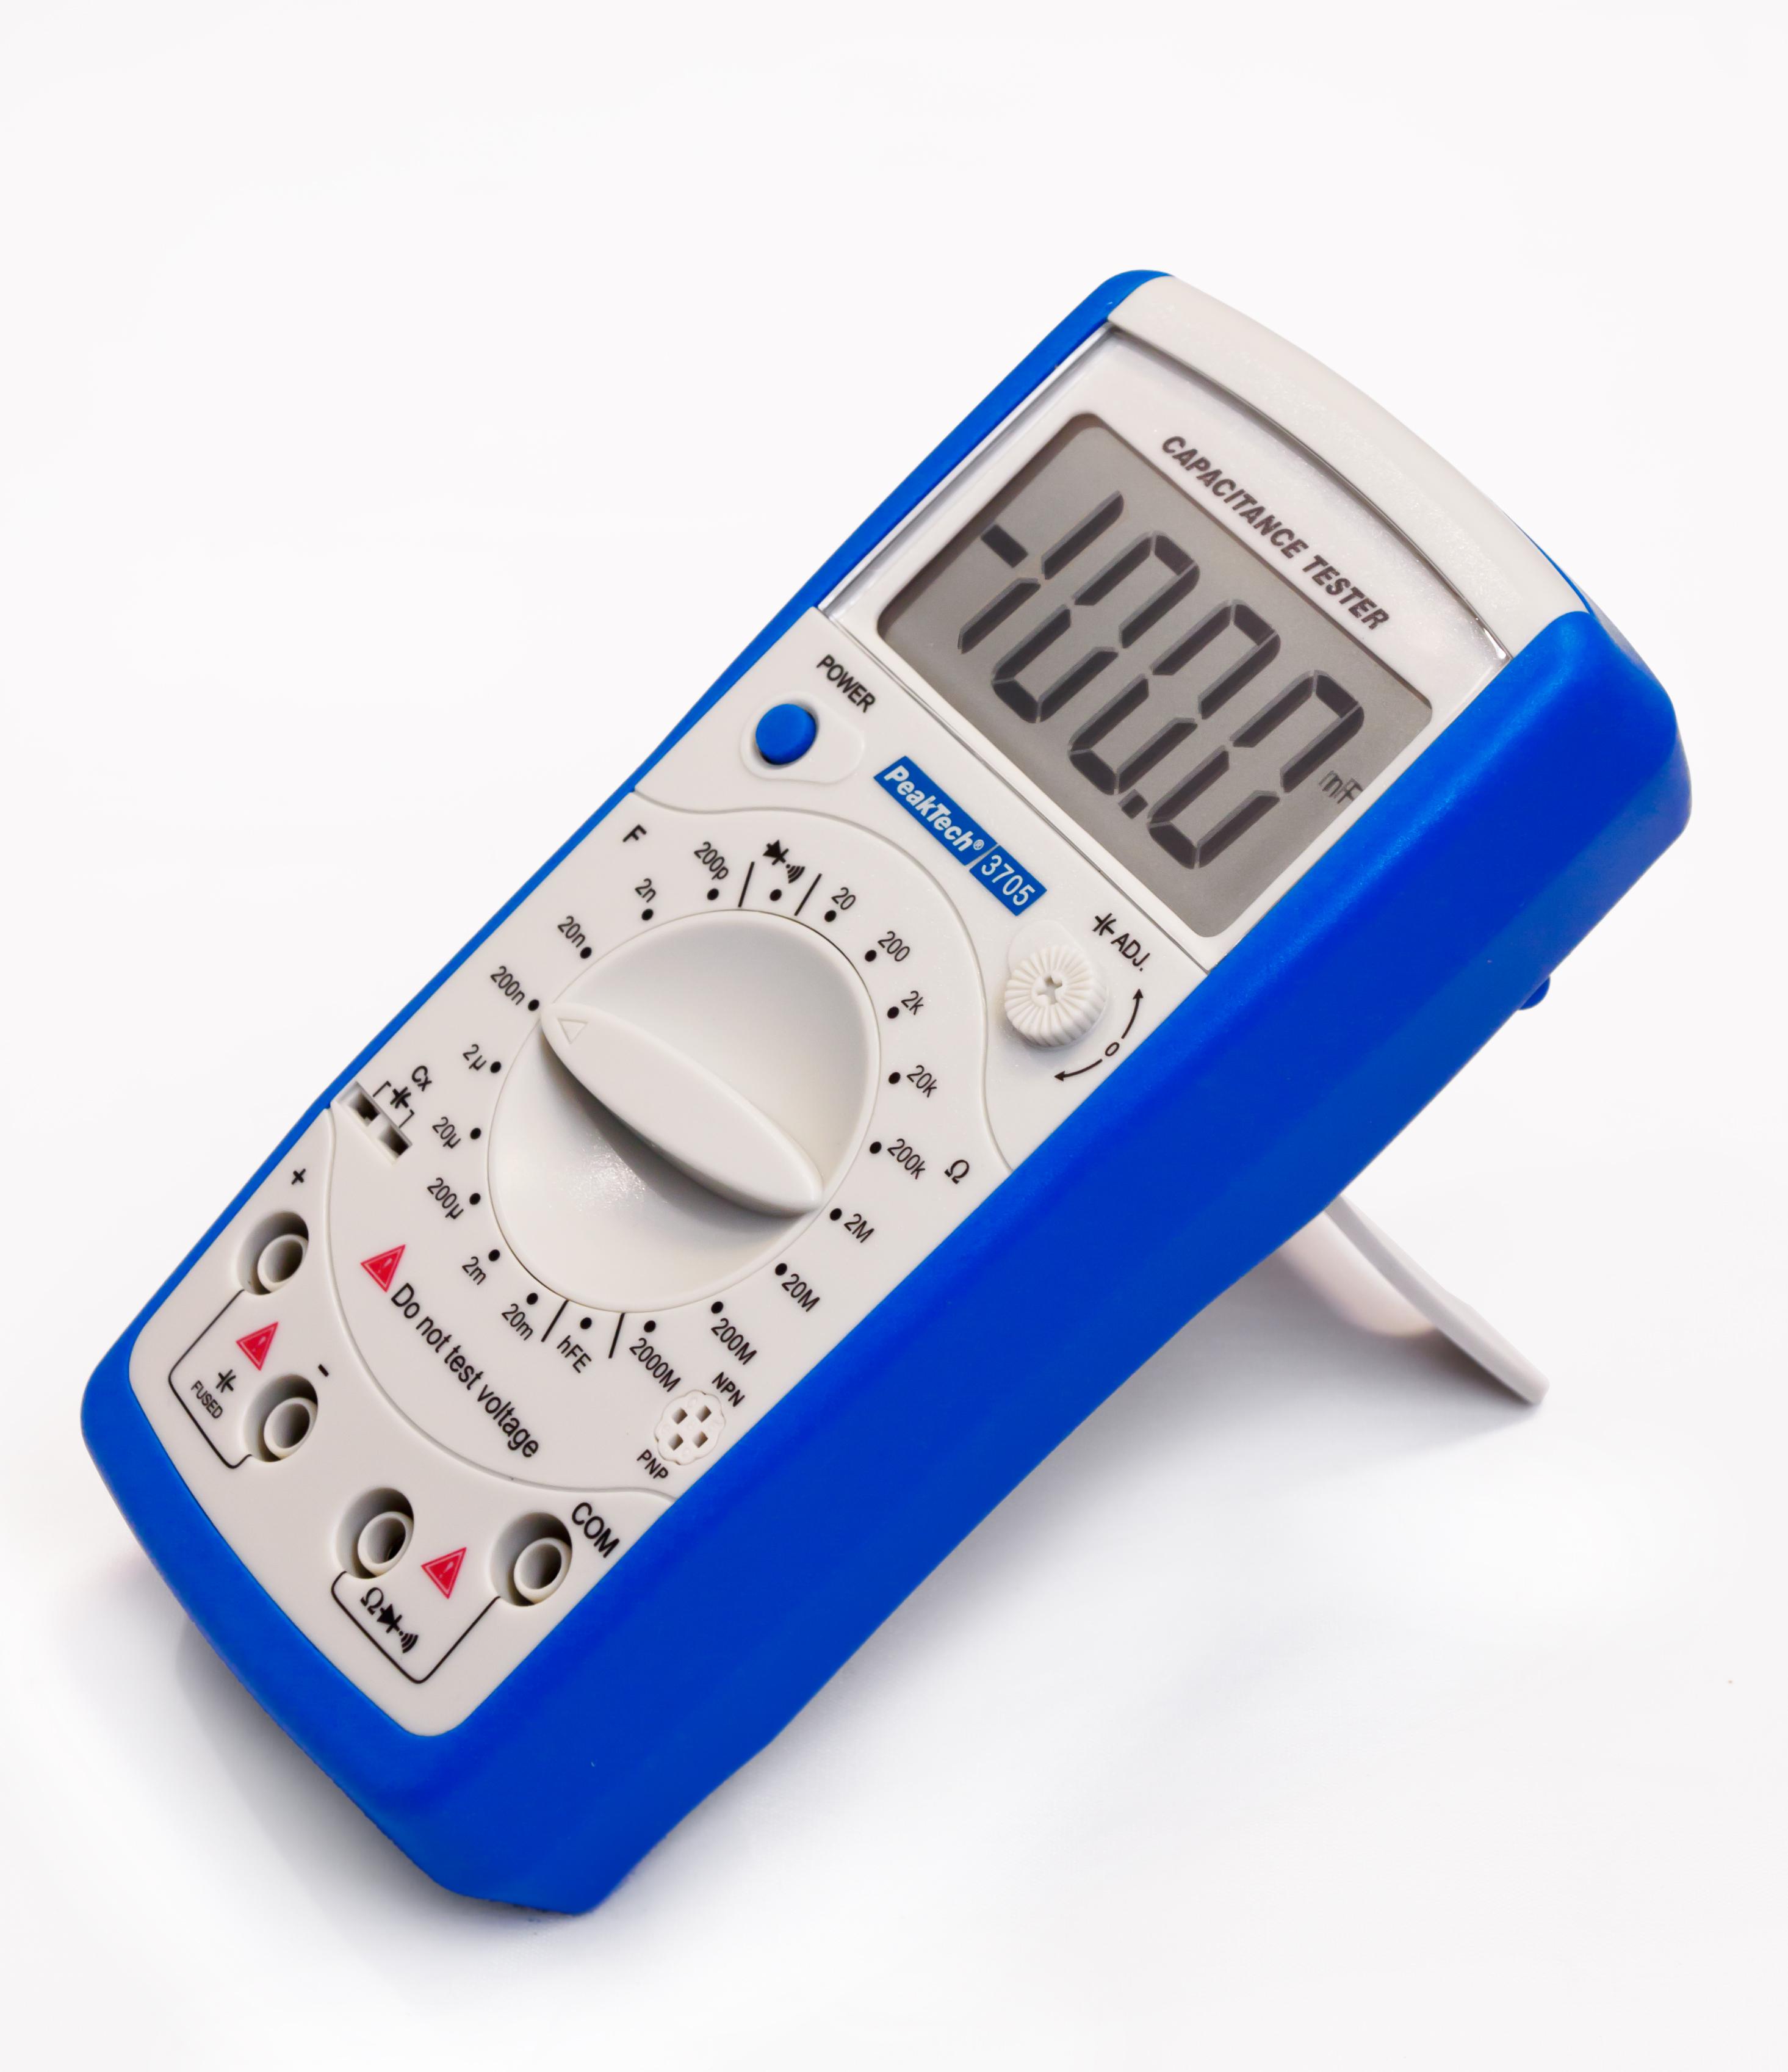 «PeakTech® P 3705» Digital capacitance meter